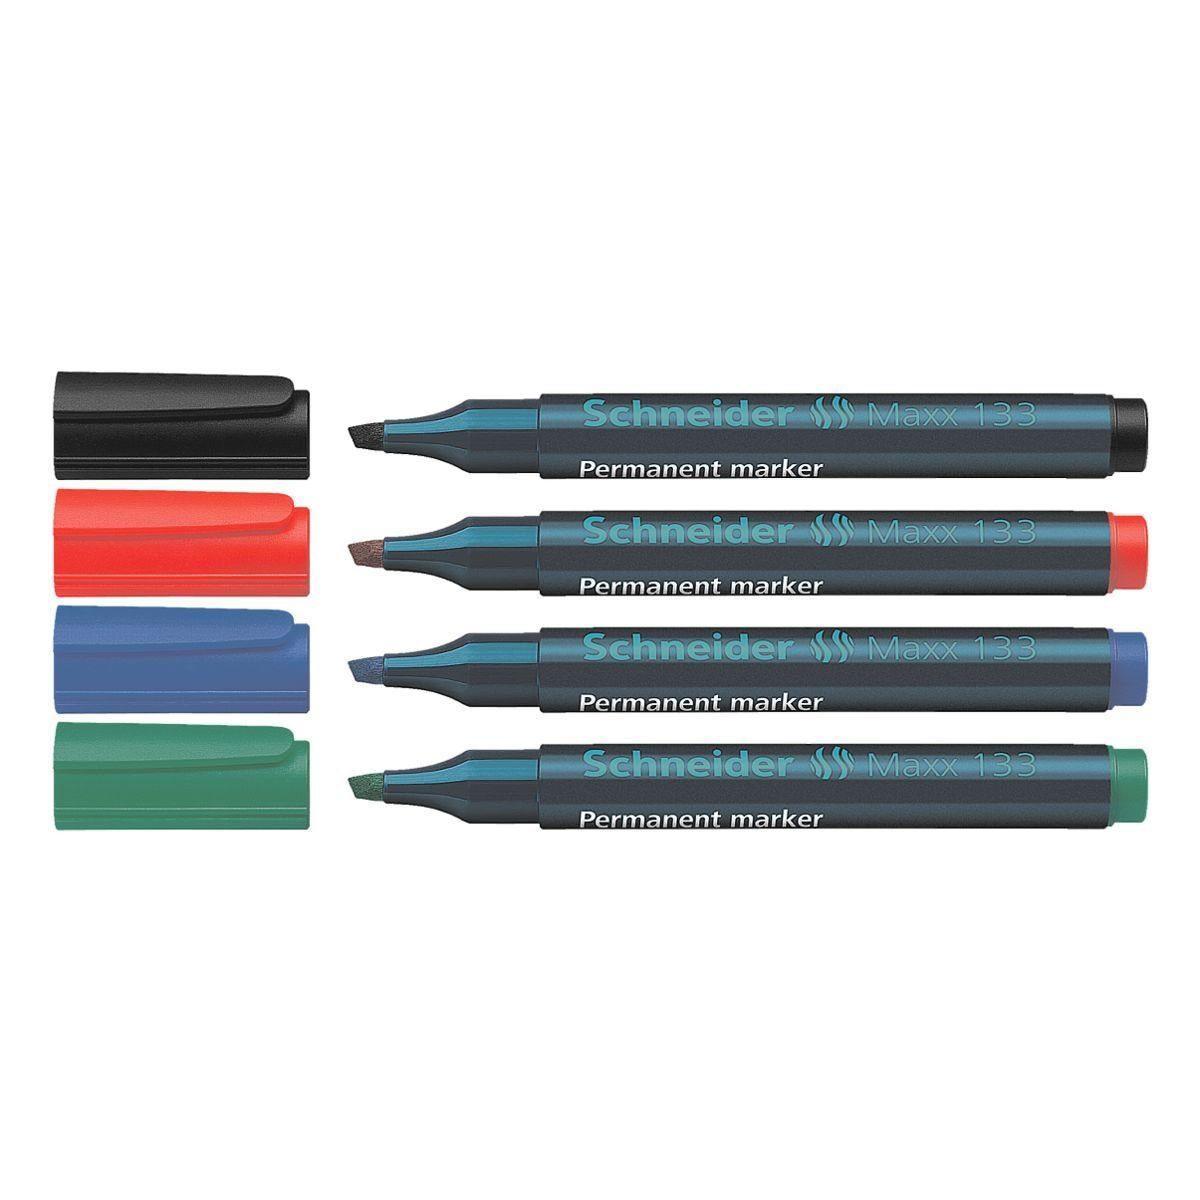 Schneider 4er-Pack Permanent-Marker »Maxx 133«